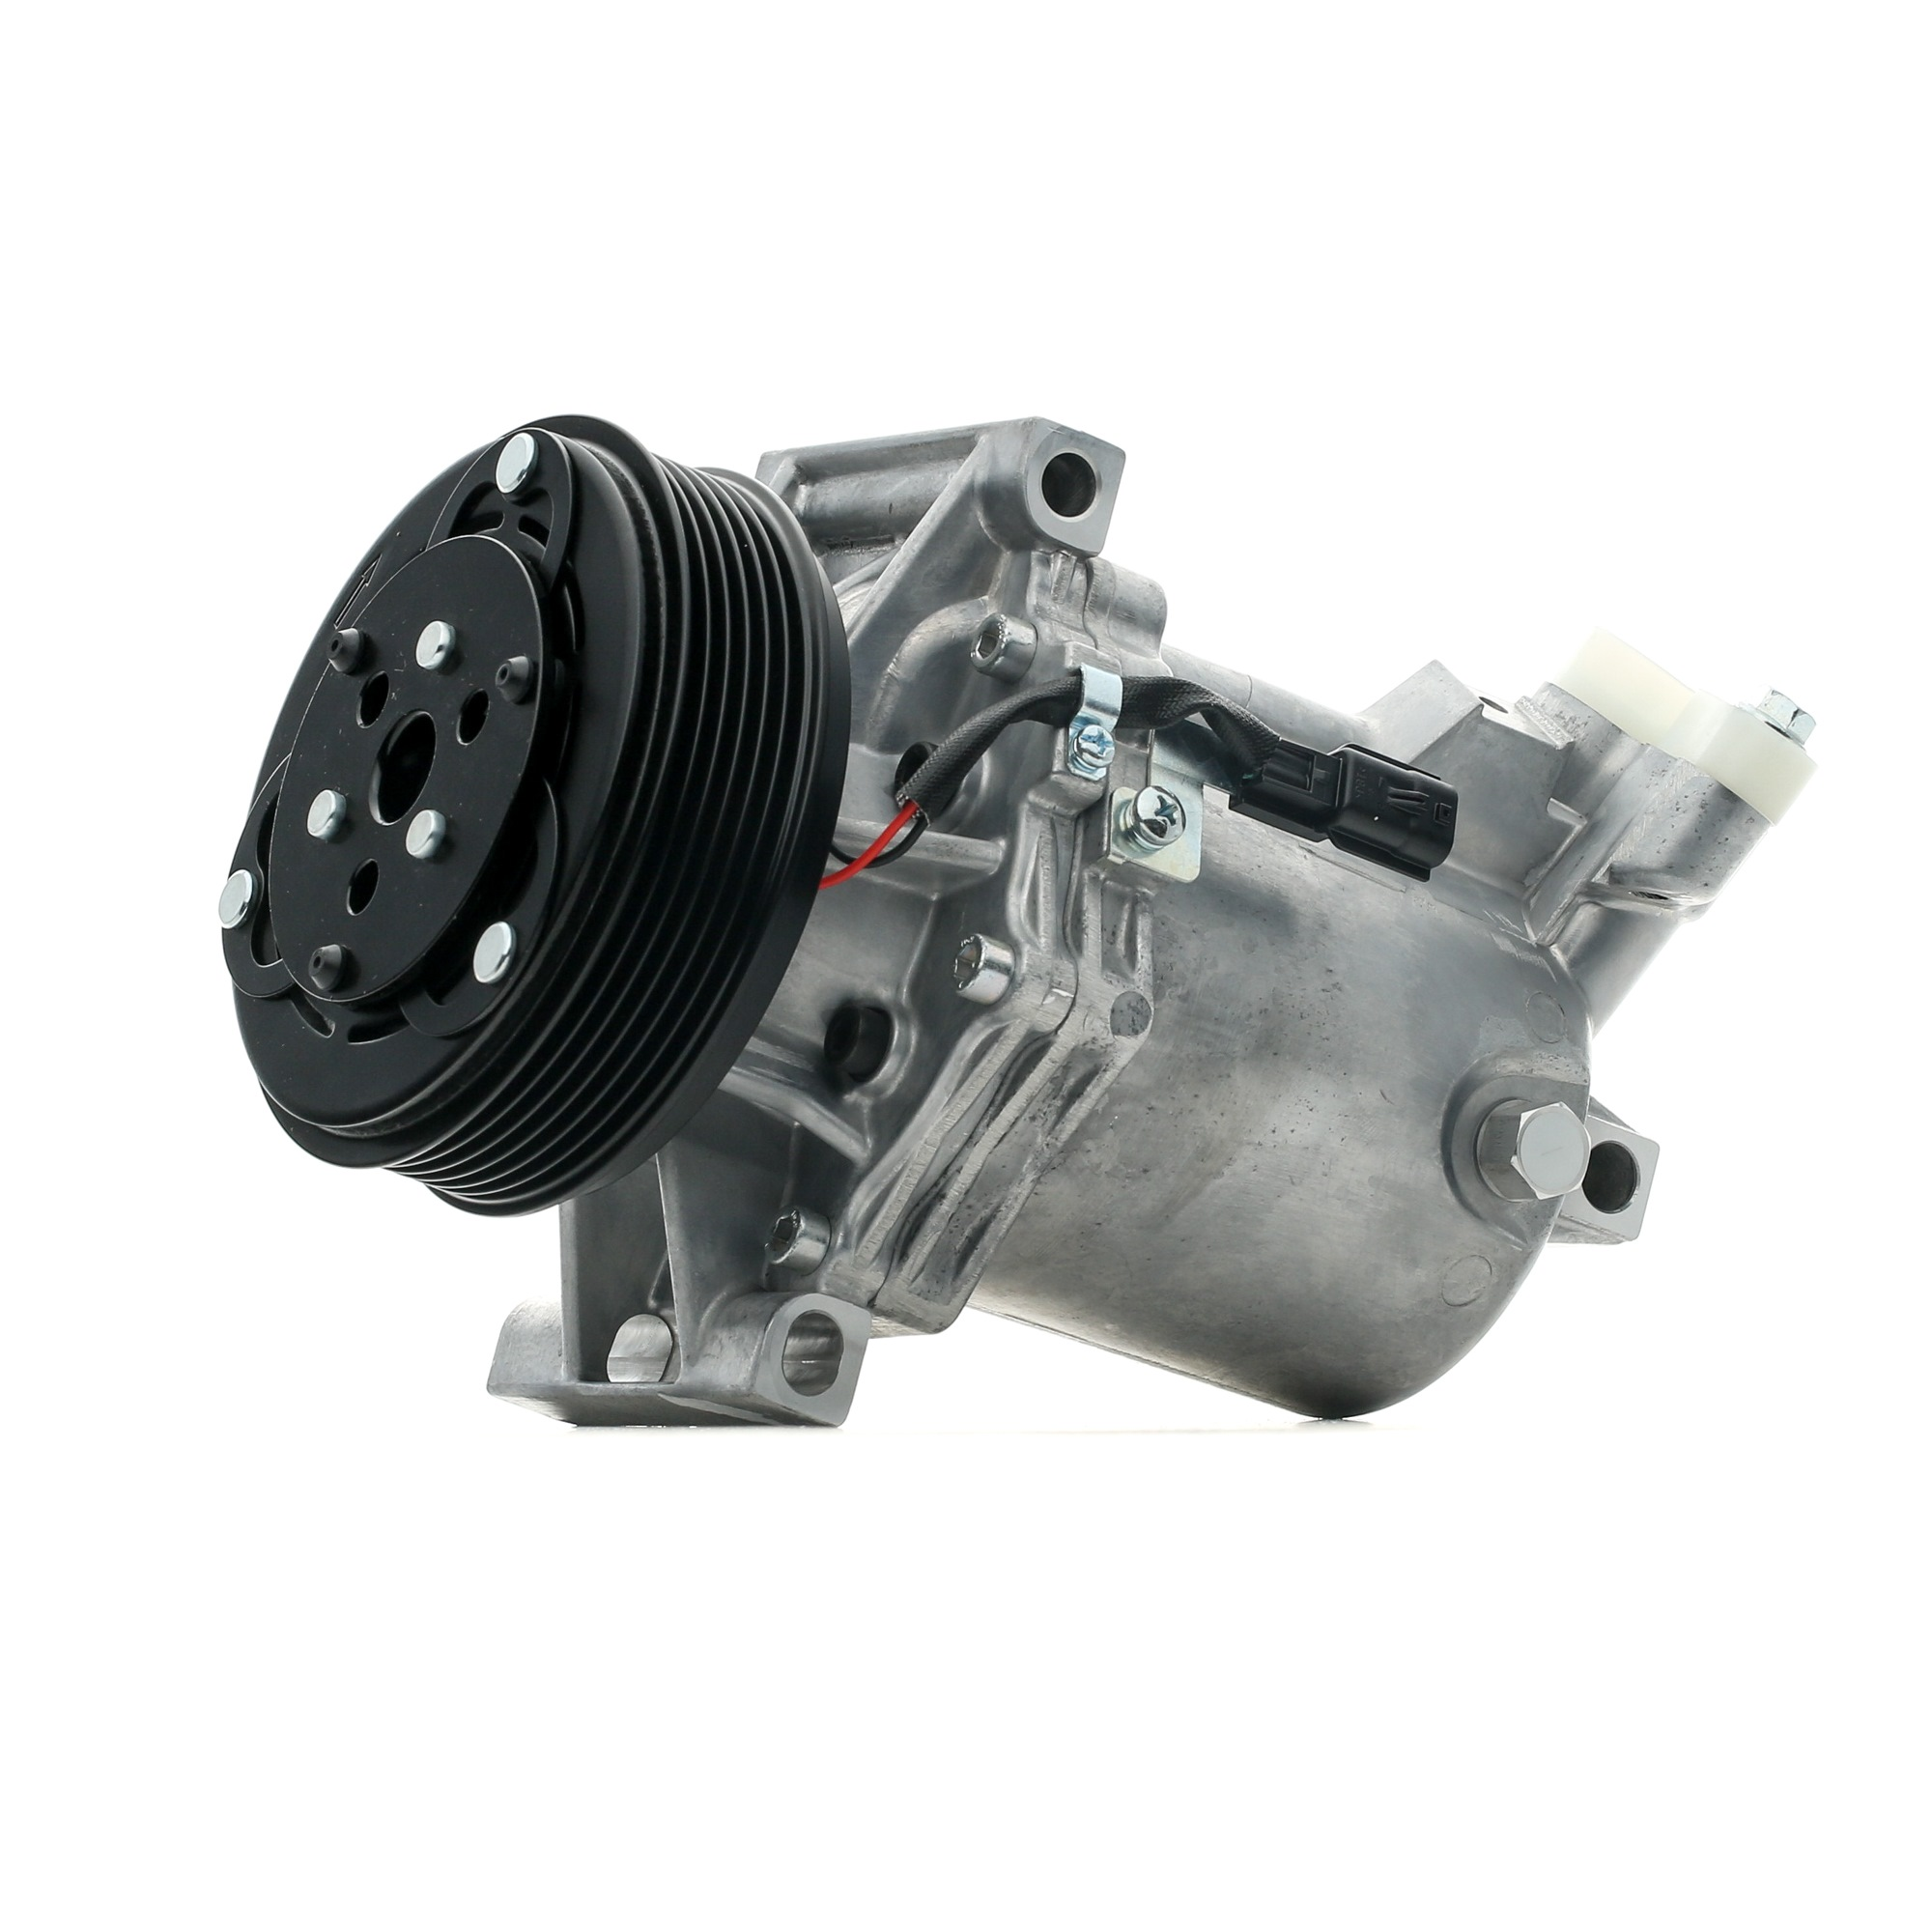 Original RENAULT Klimakompressor 447K0233